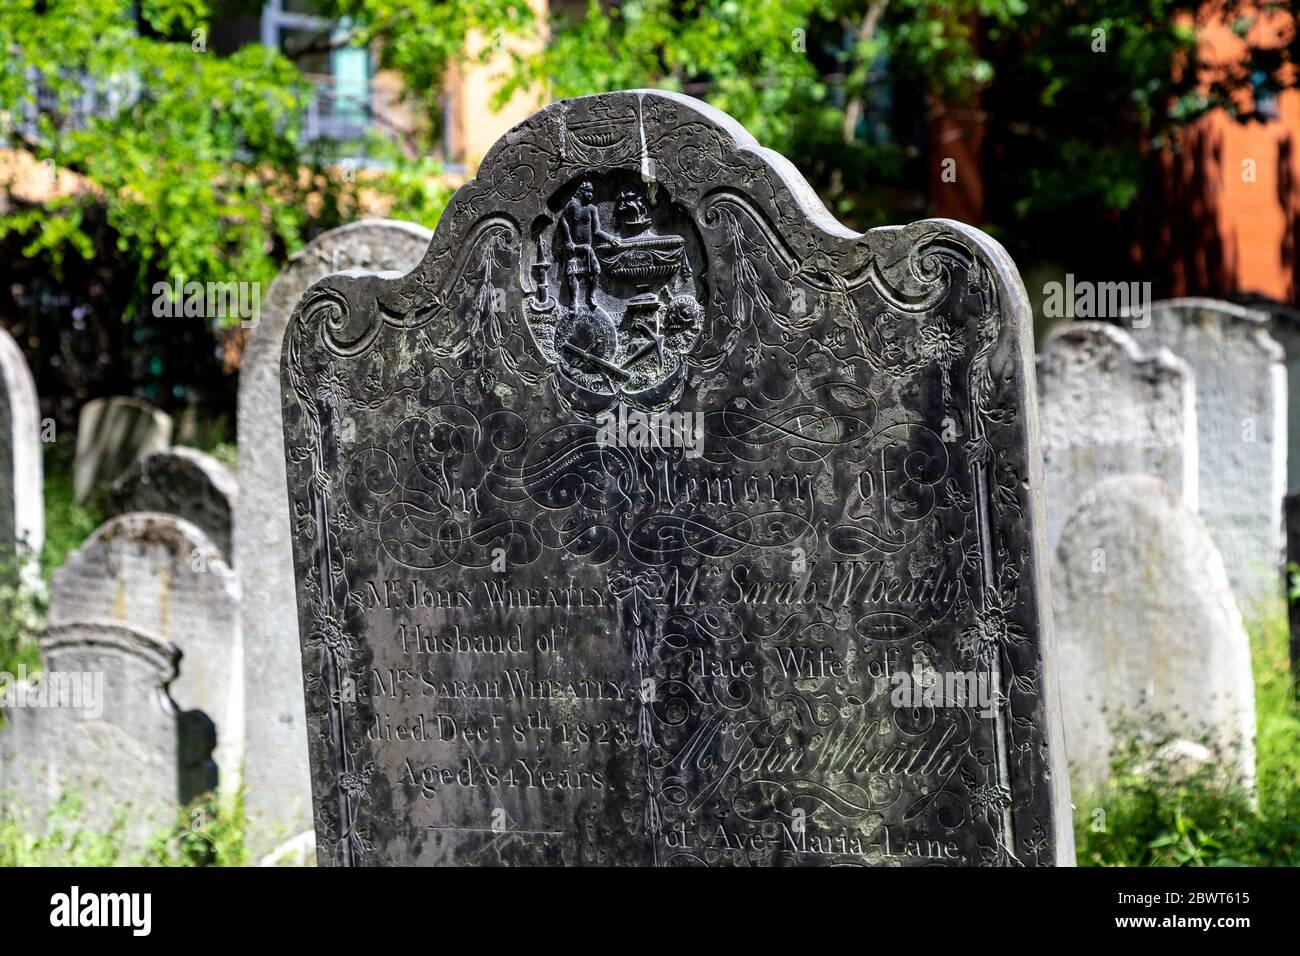 Bunhill Fields Burial Ground, London, UK Stock Photo